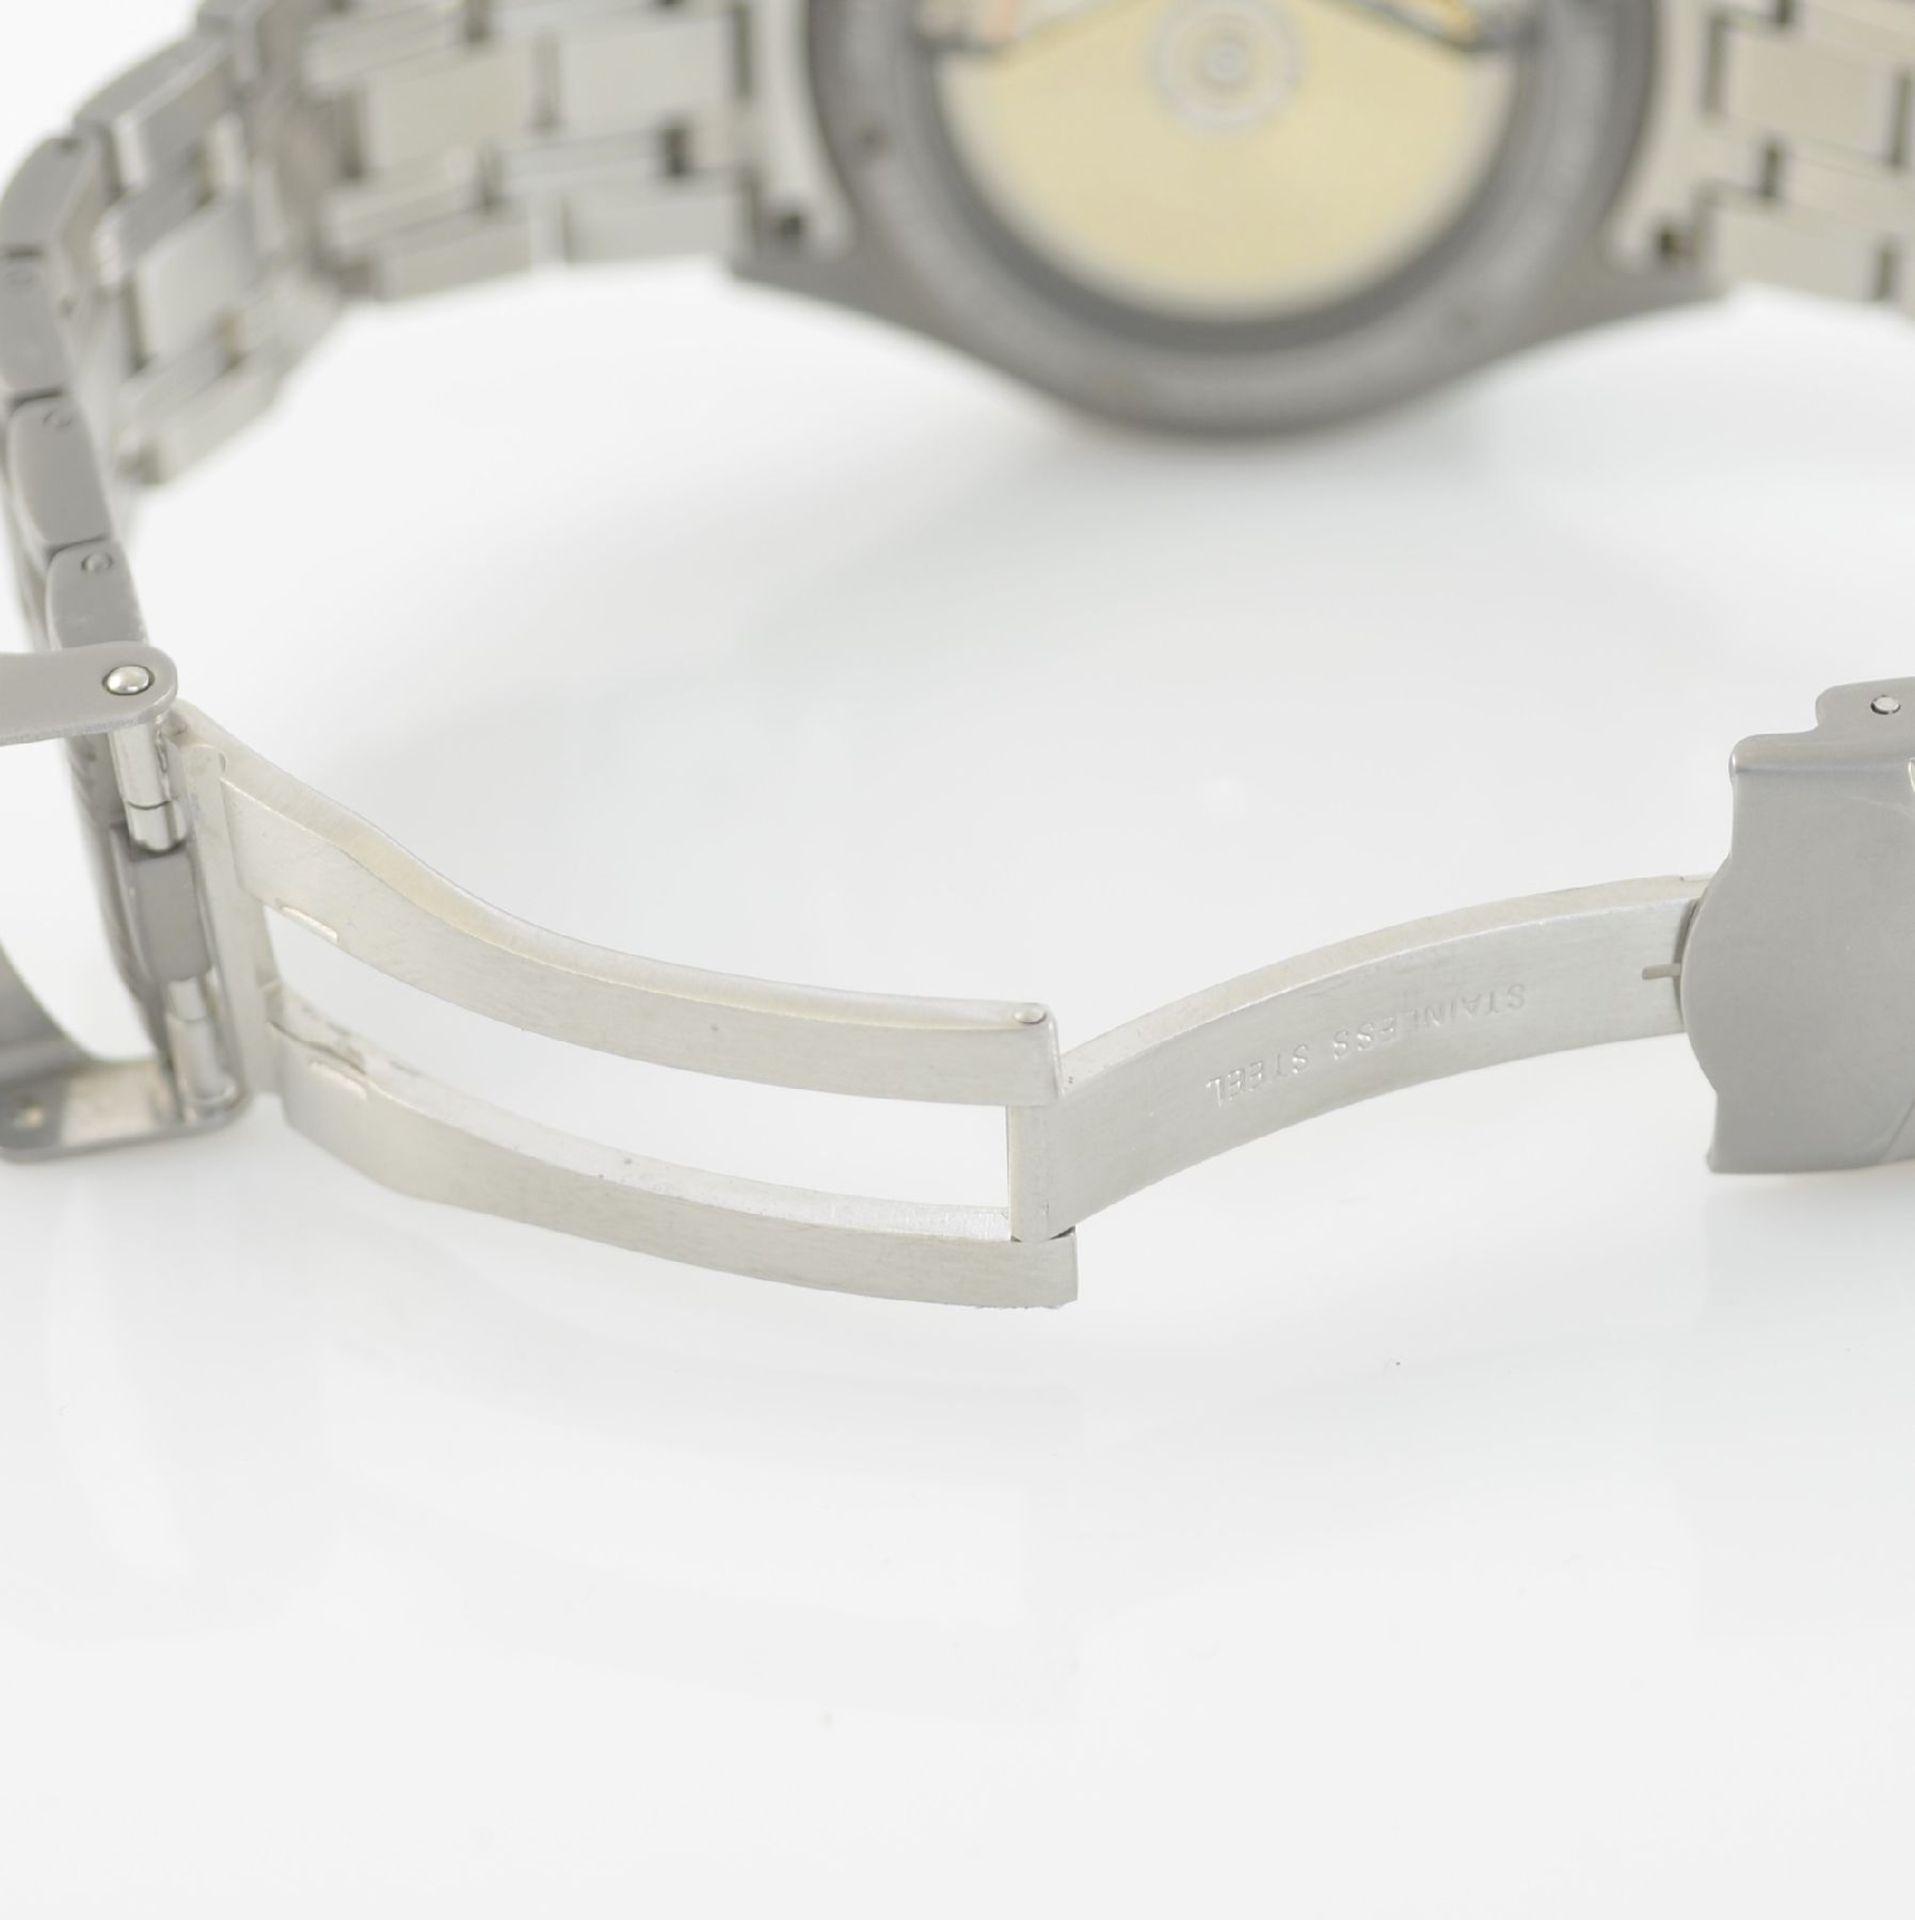 BWC Armbandchronograph, Automatik, Schweiz um 2010, matt. Edelstahlgeh. inkl. orig. Gliederband m. - Bild 7 aus 7